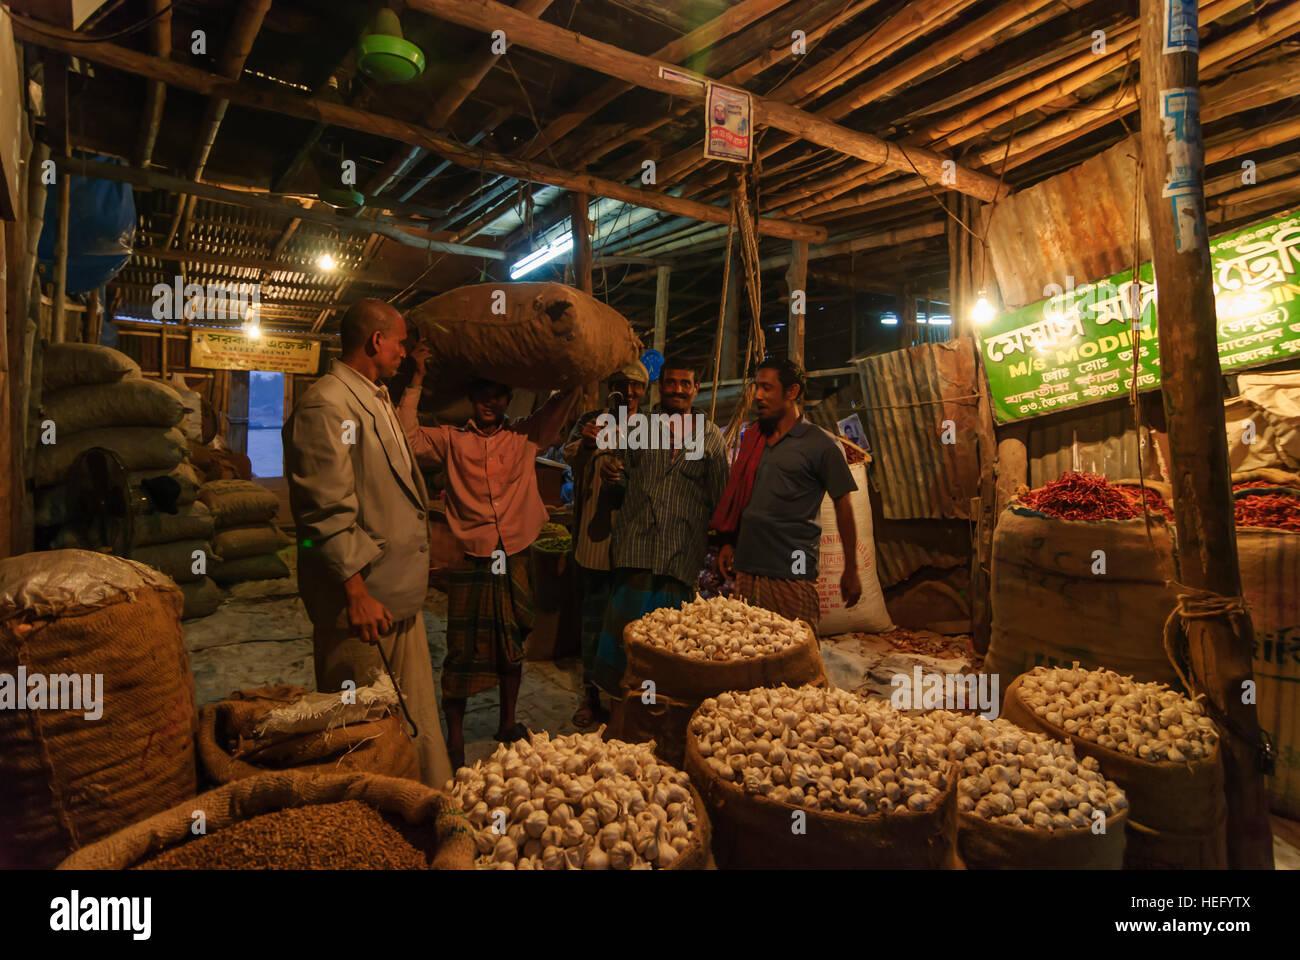 Khulna: Old town; Market, Garlic in jute sacks, Khulna Division, Bangladesh - Stock Image